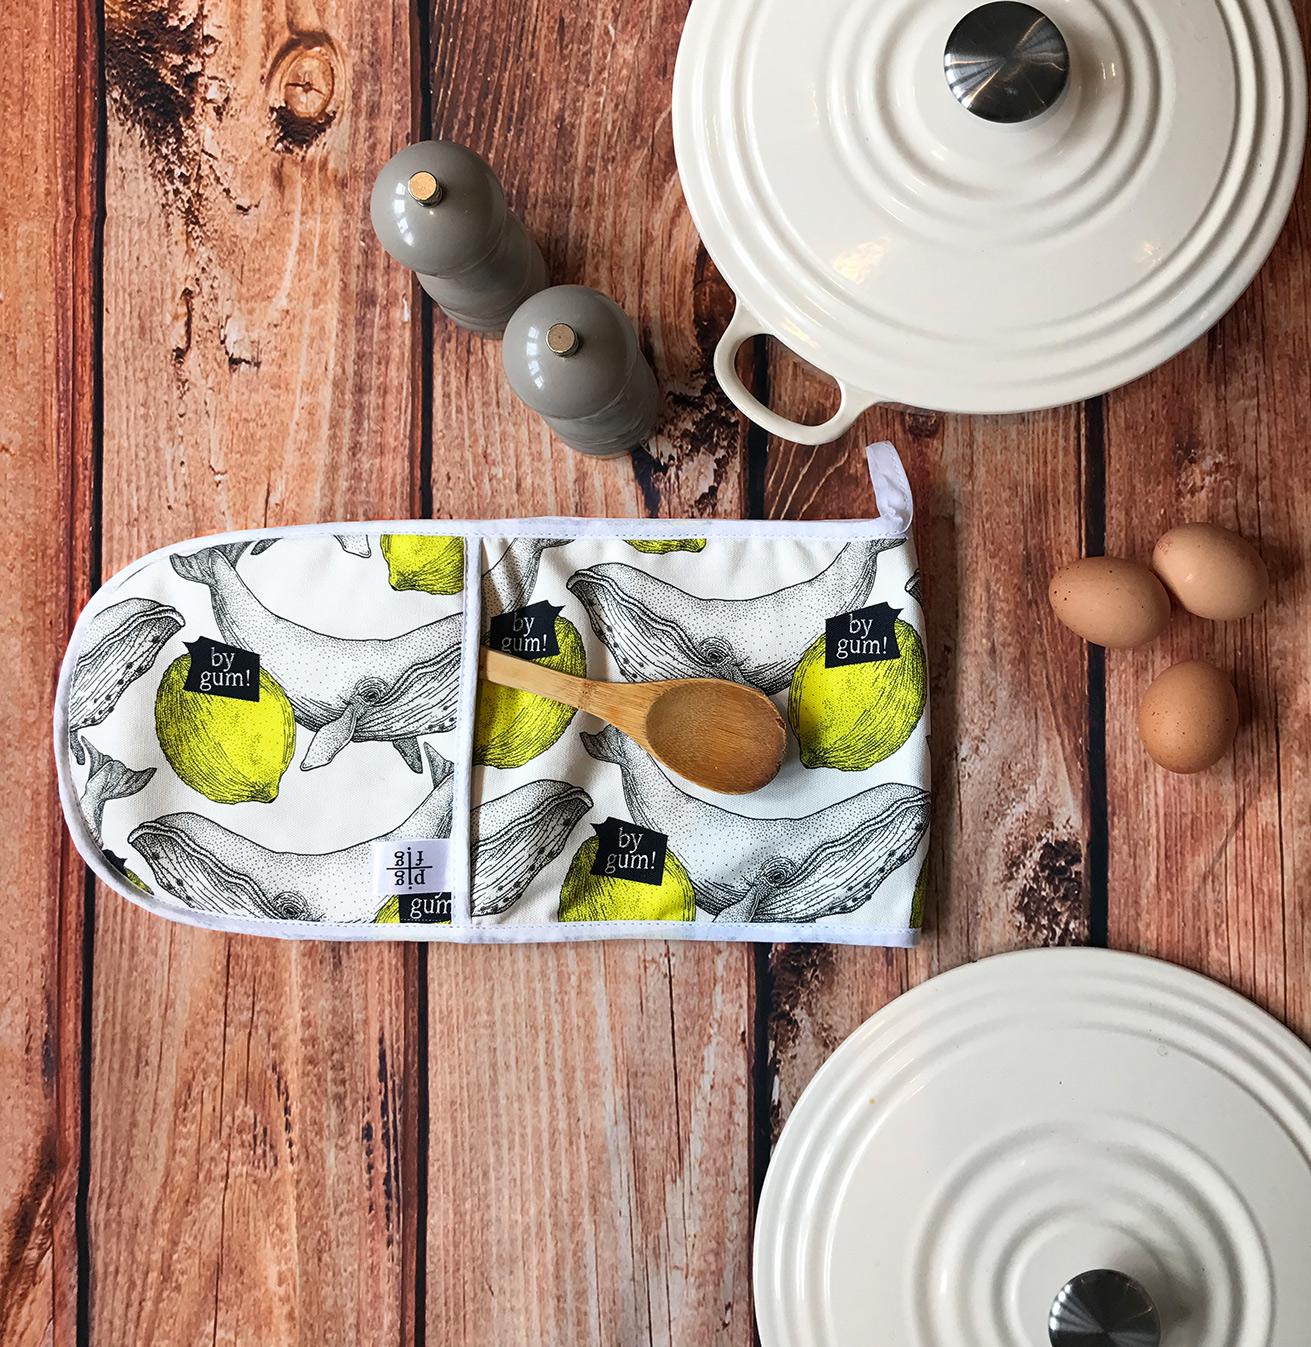 Whale & Lemon Oven Glove